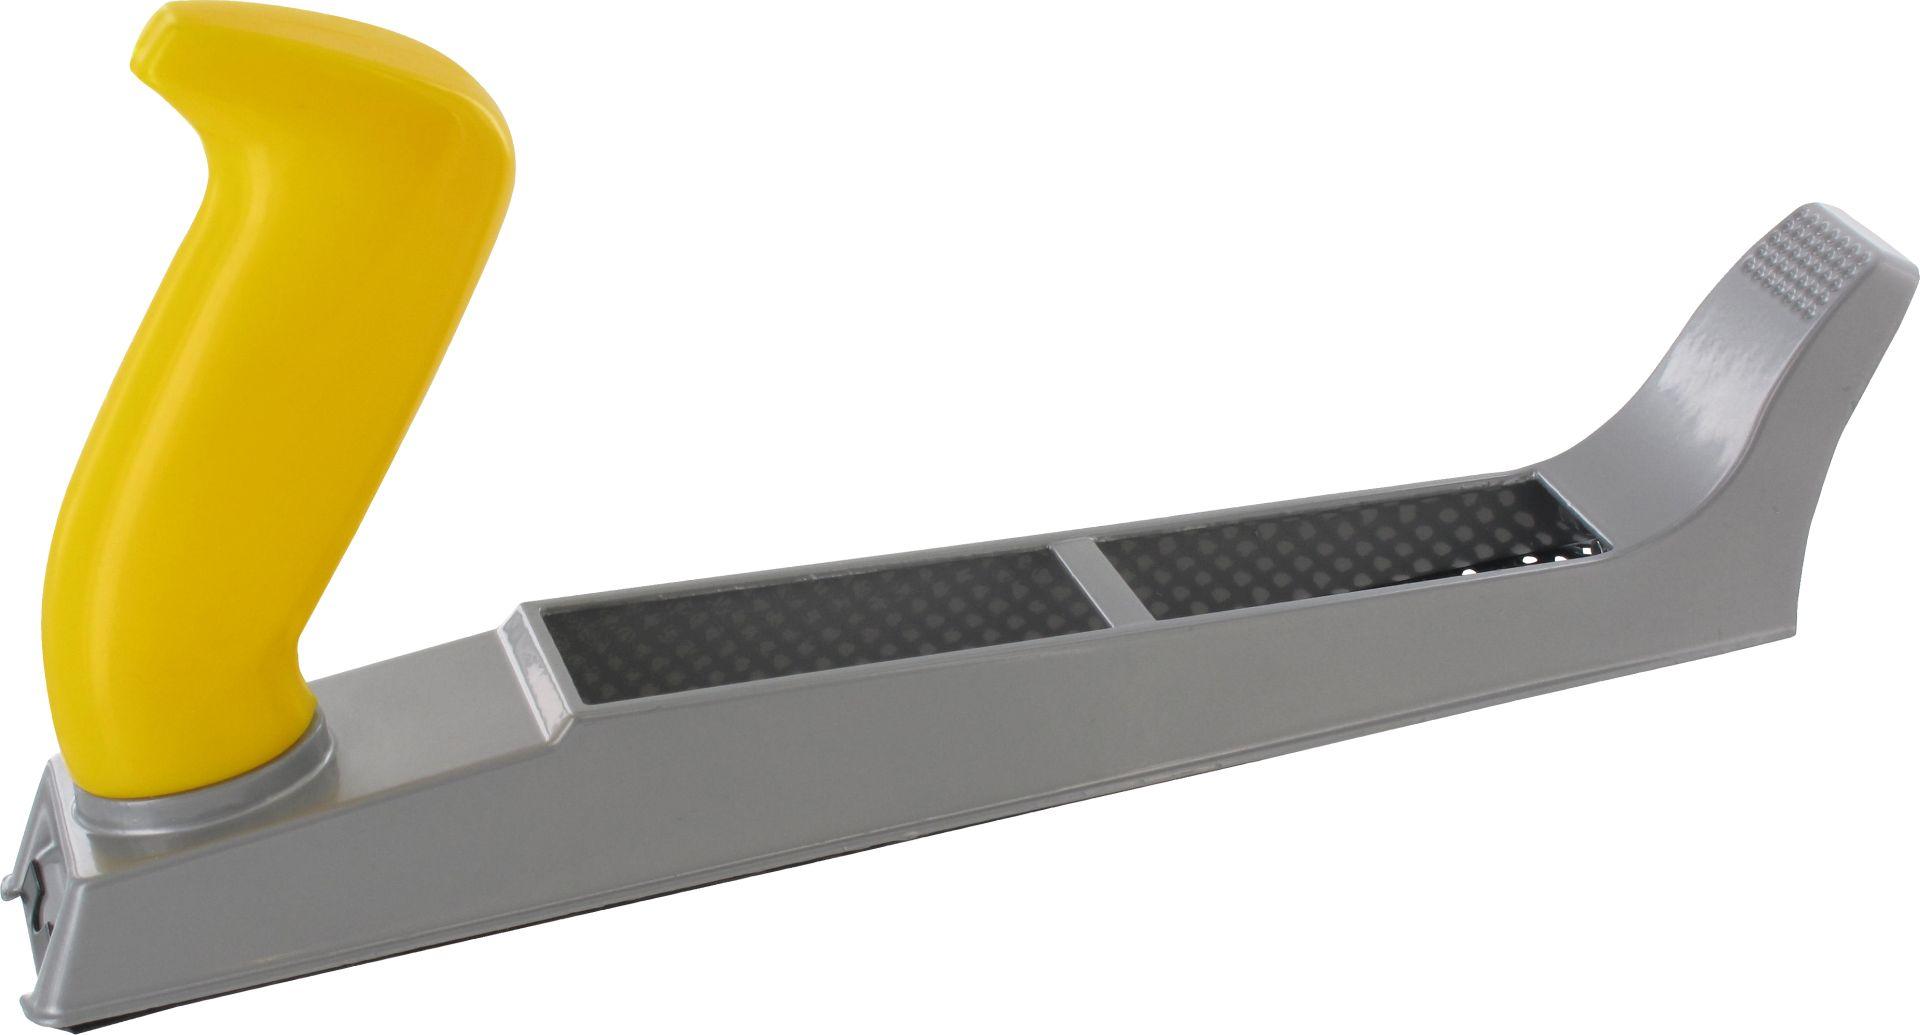 TRIUSO Gipskarton Standardhobel, 42 x 250 mm